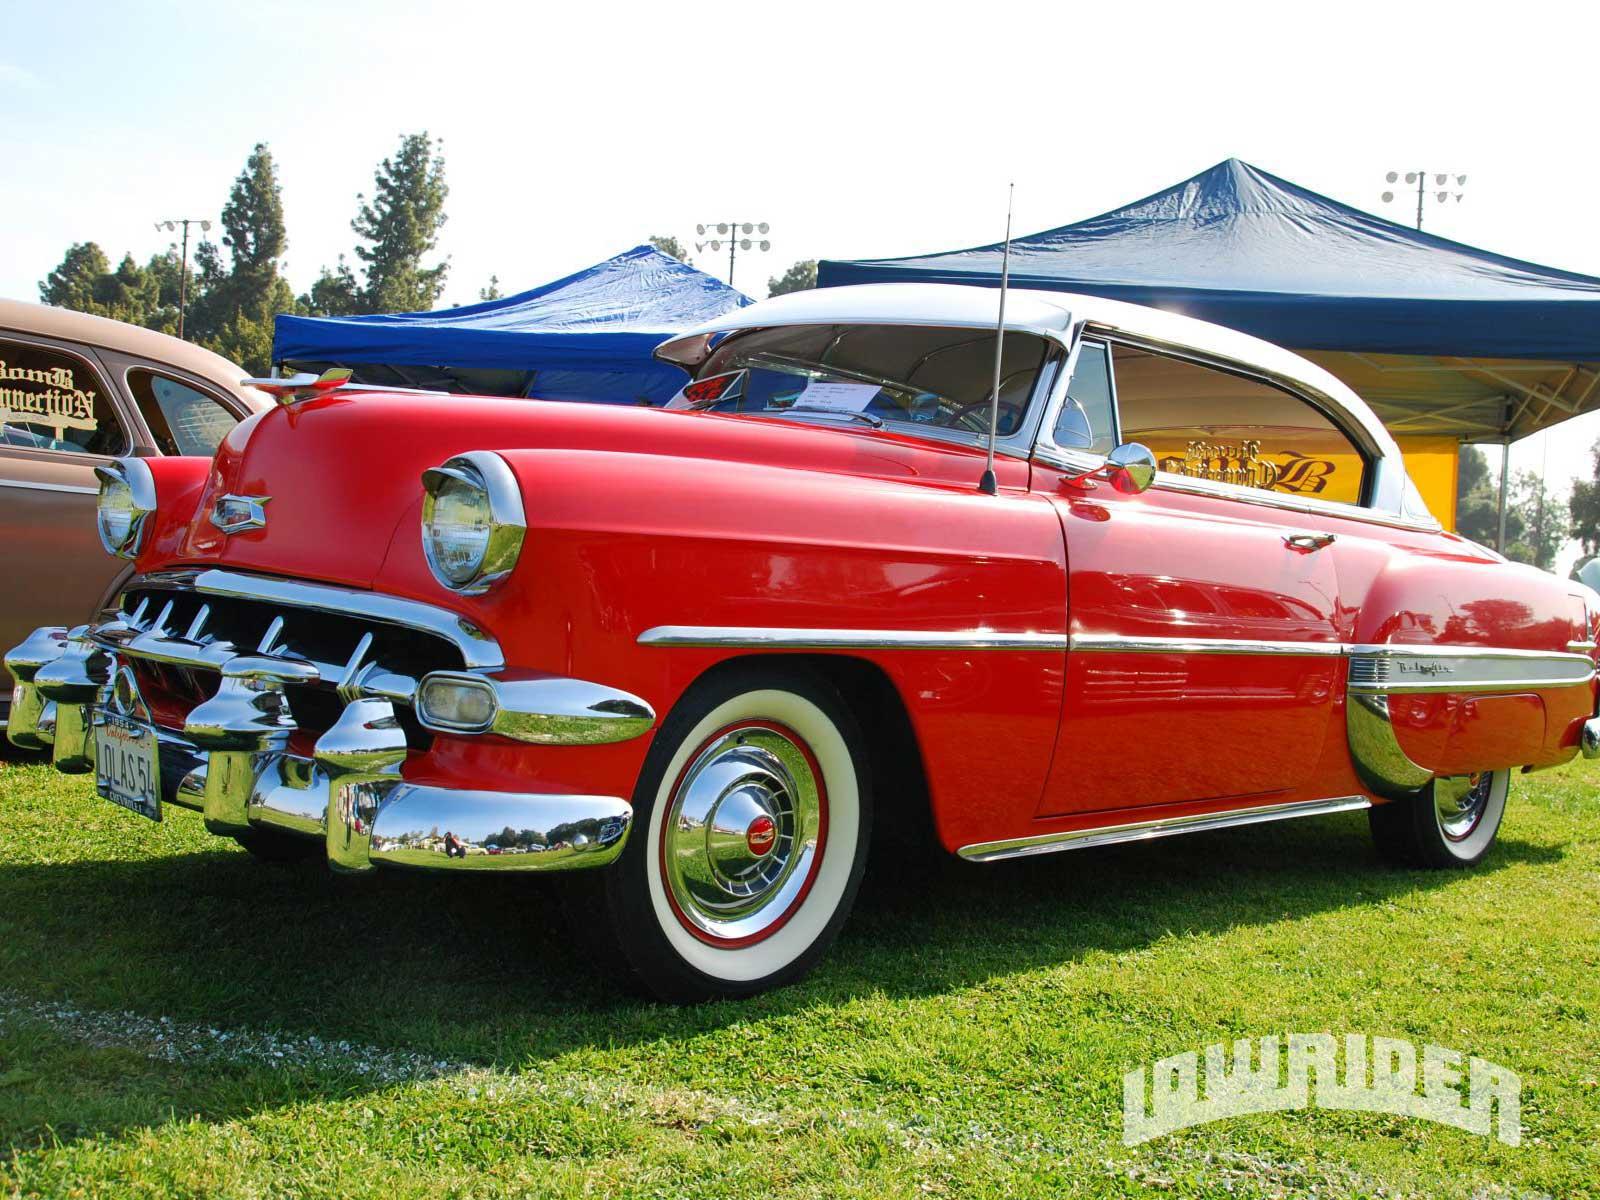 1957 Chevy Impala Lowrider